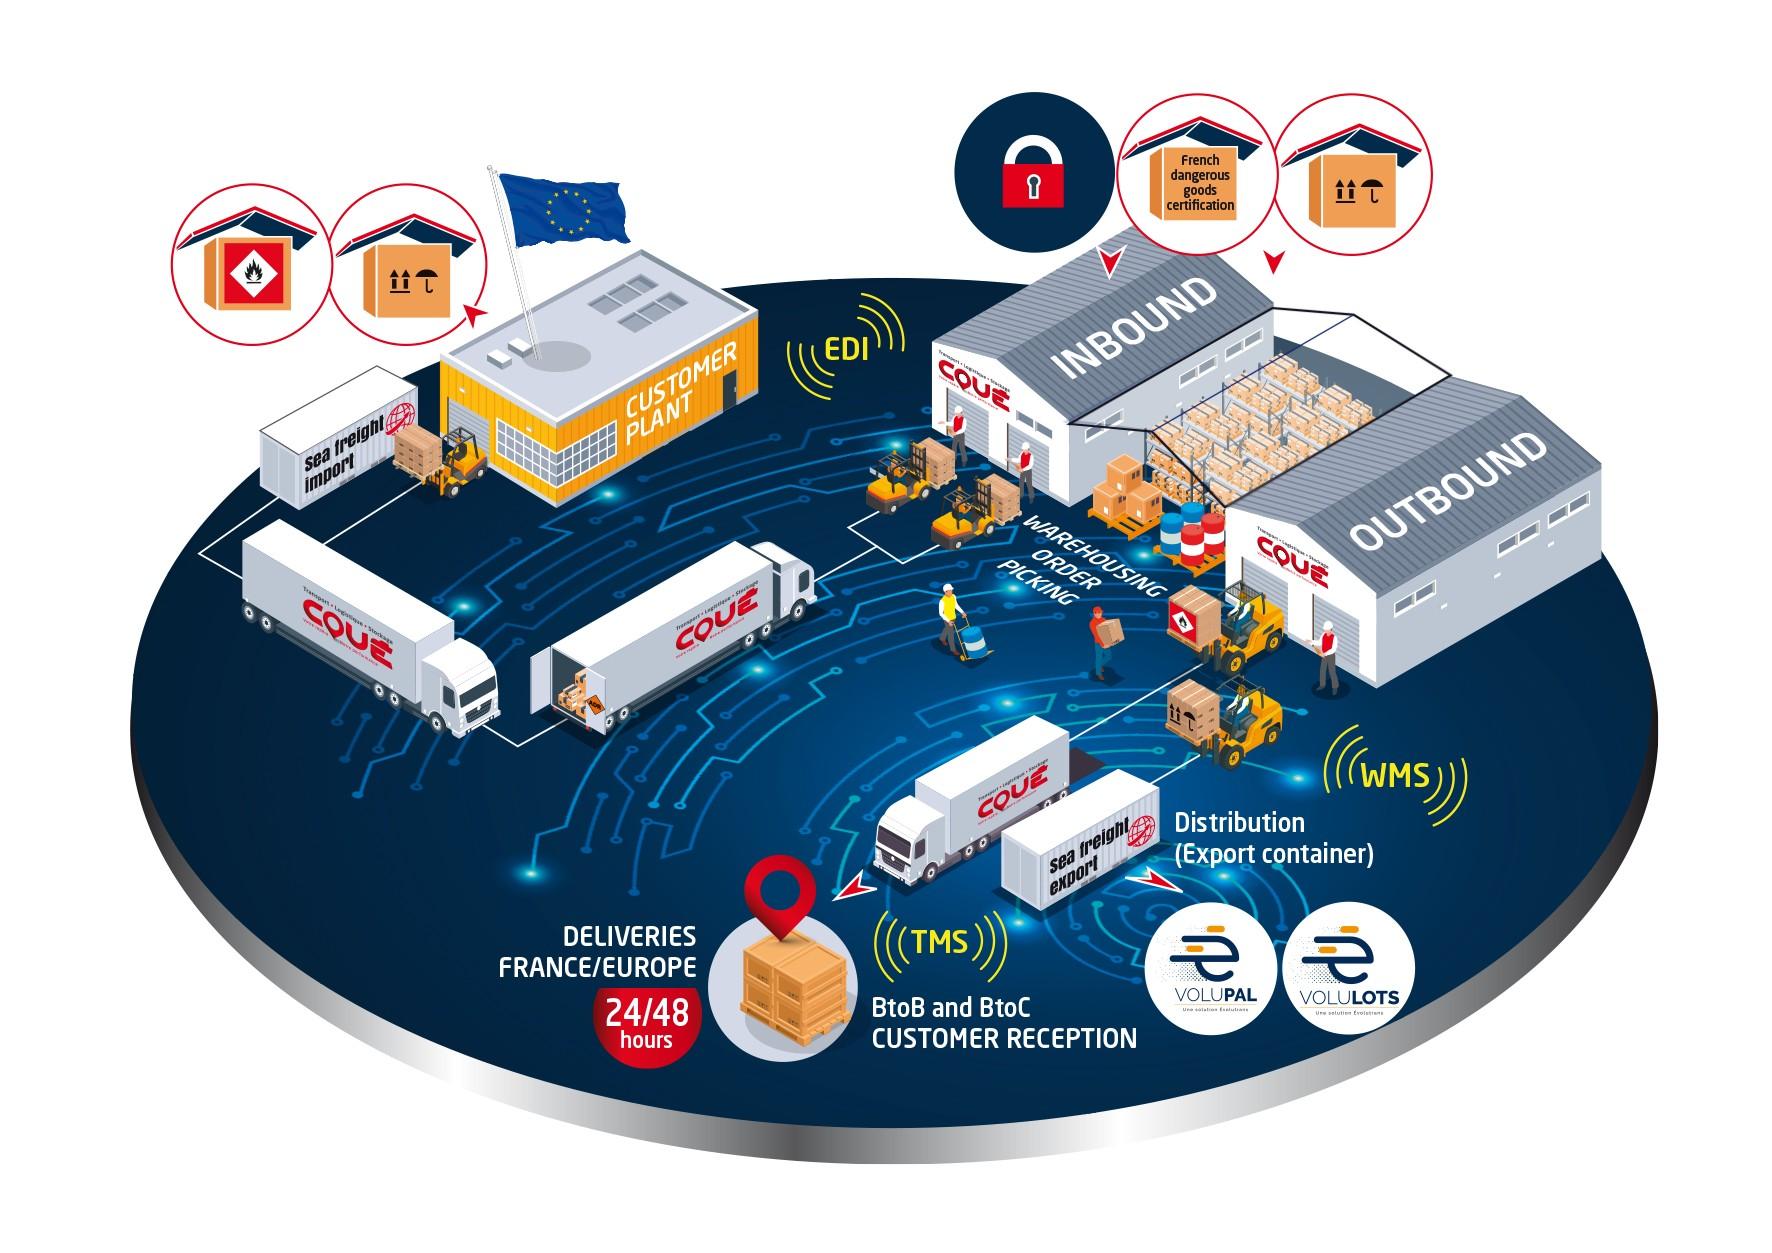 logistics platform storage transports coue